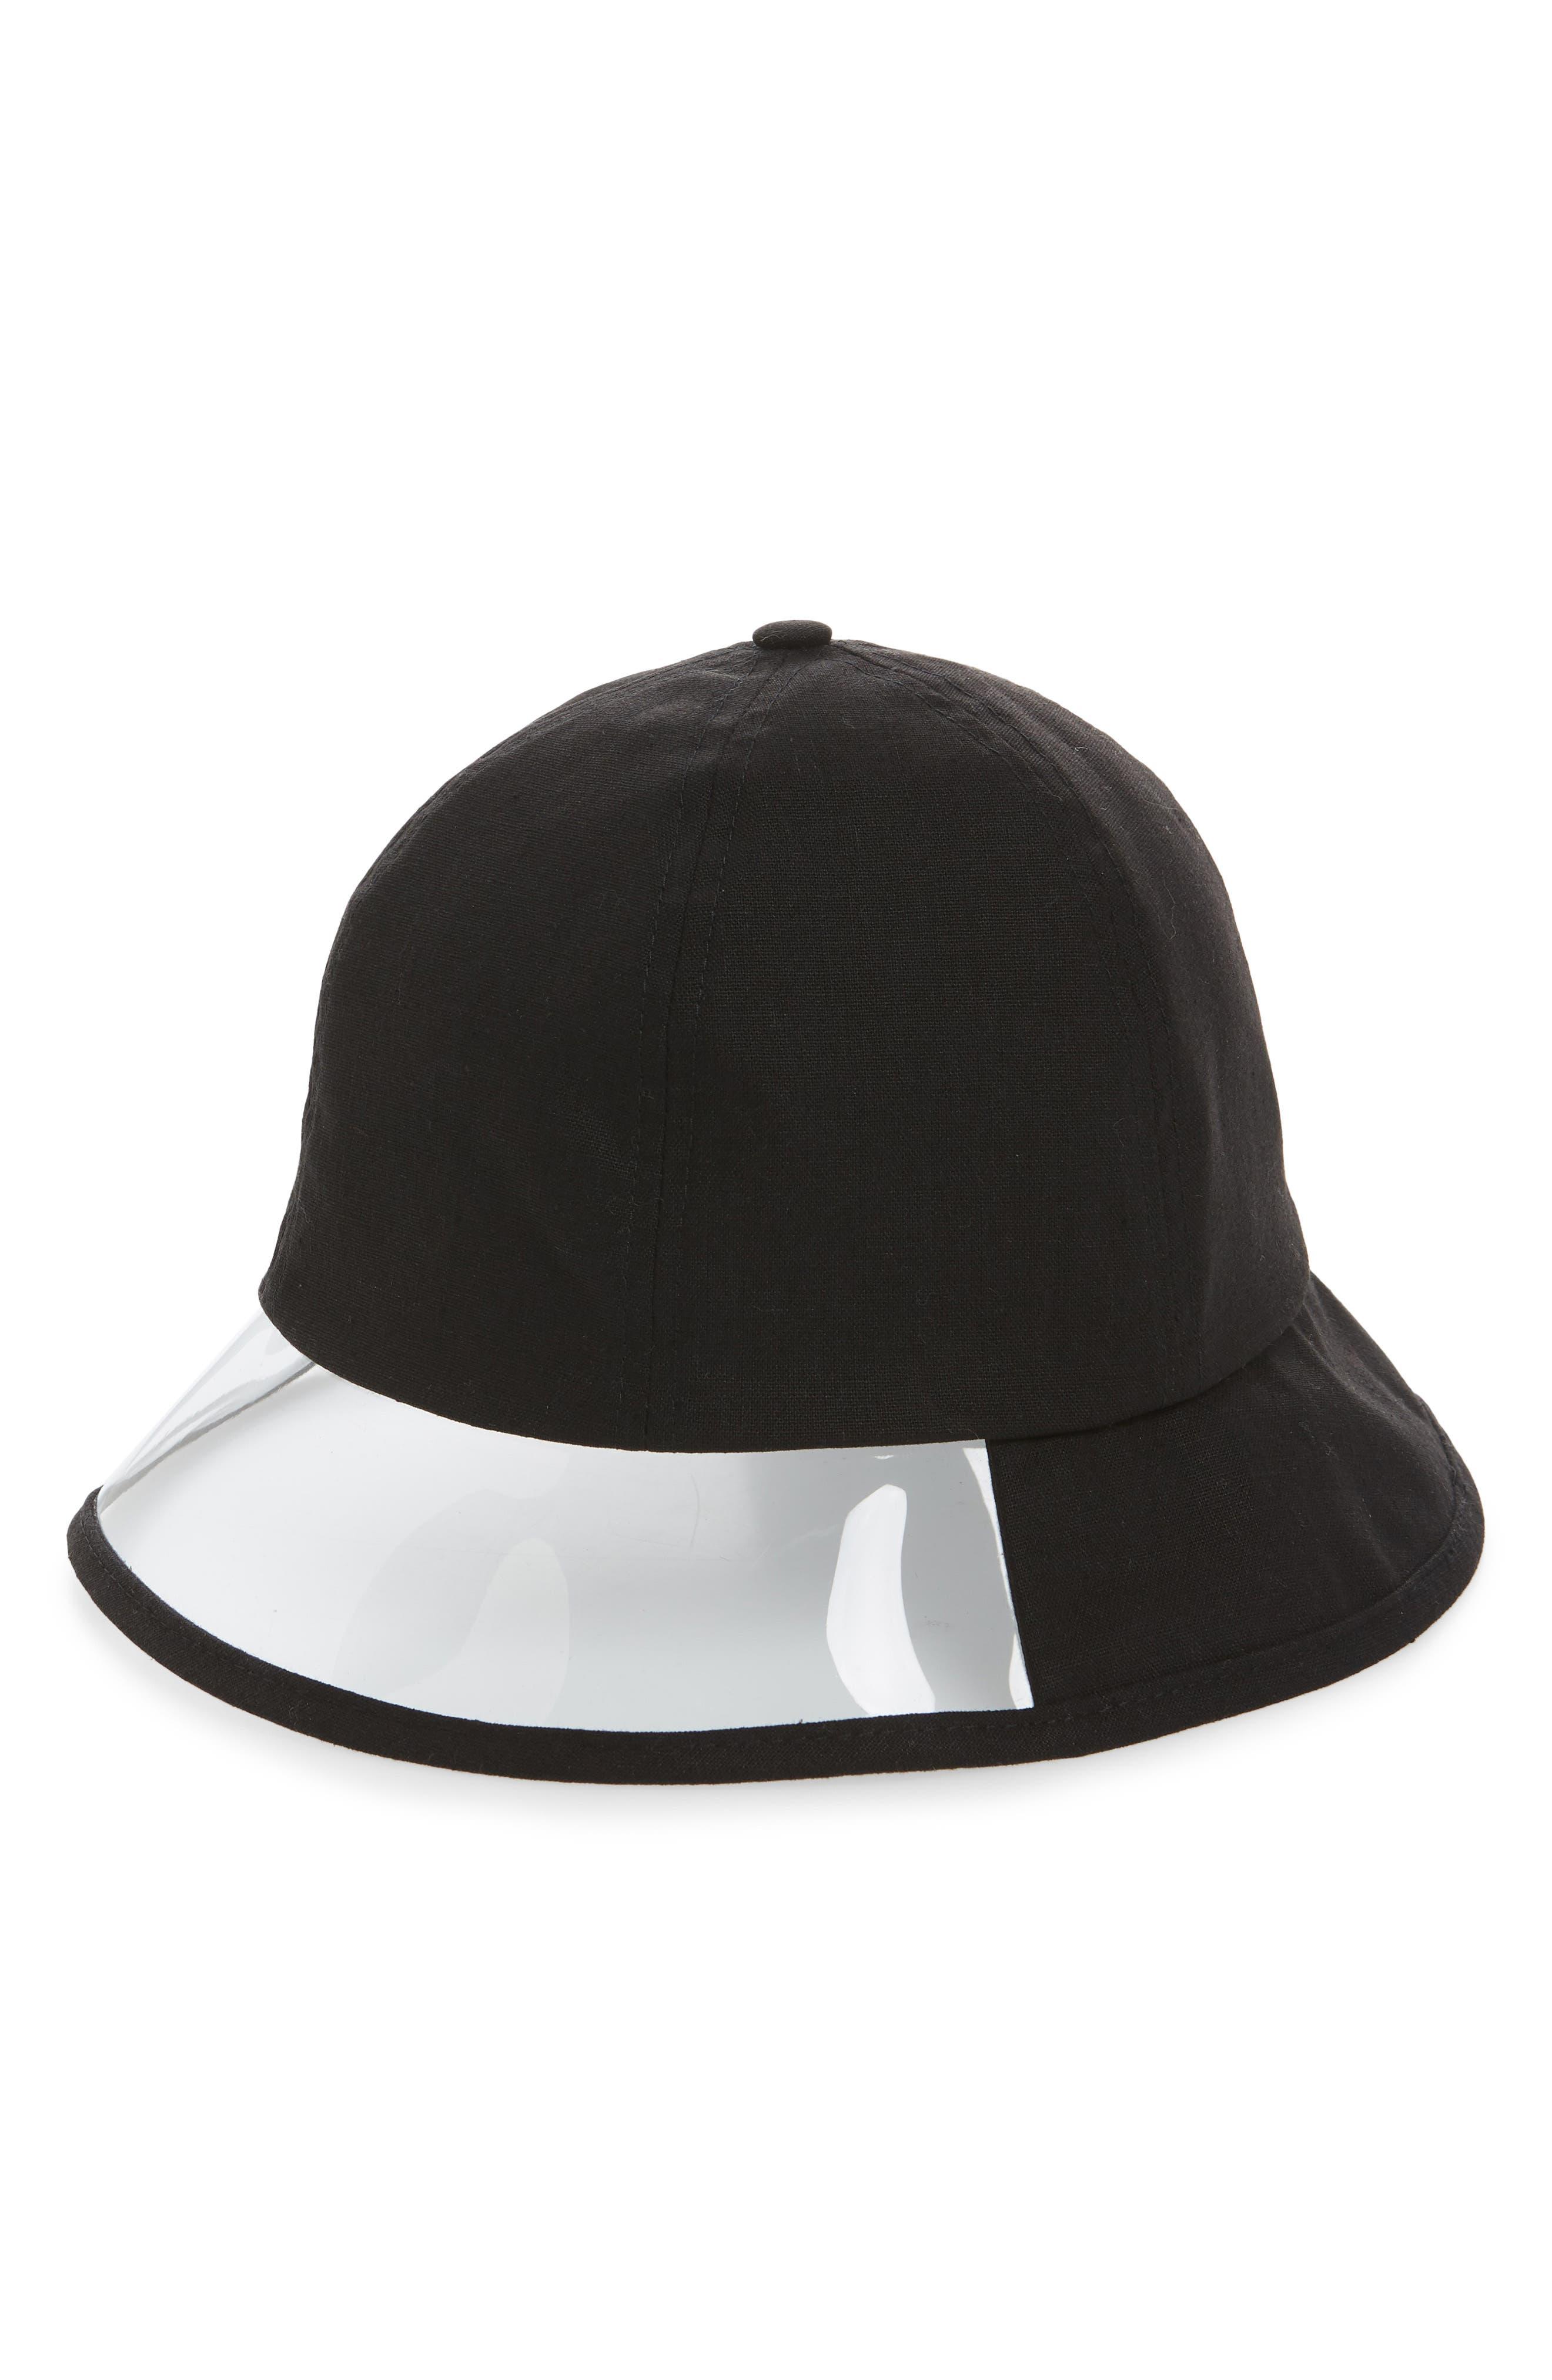 Transparent Panel Canvas Bucket Hat - Black